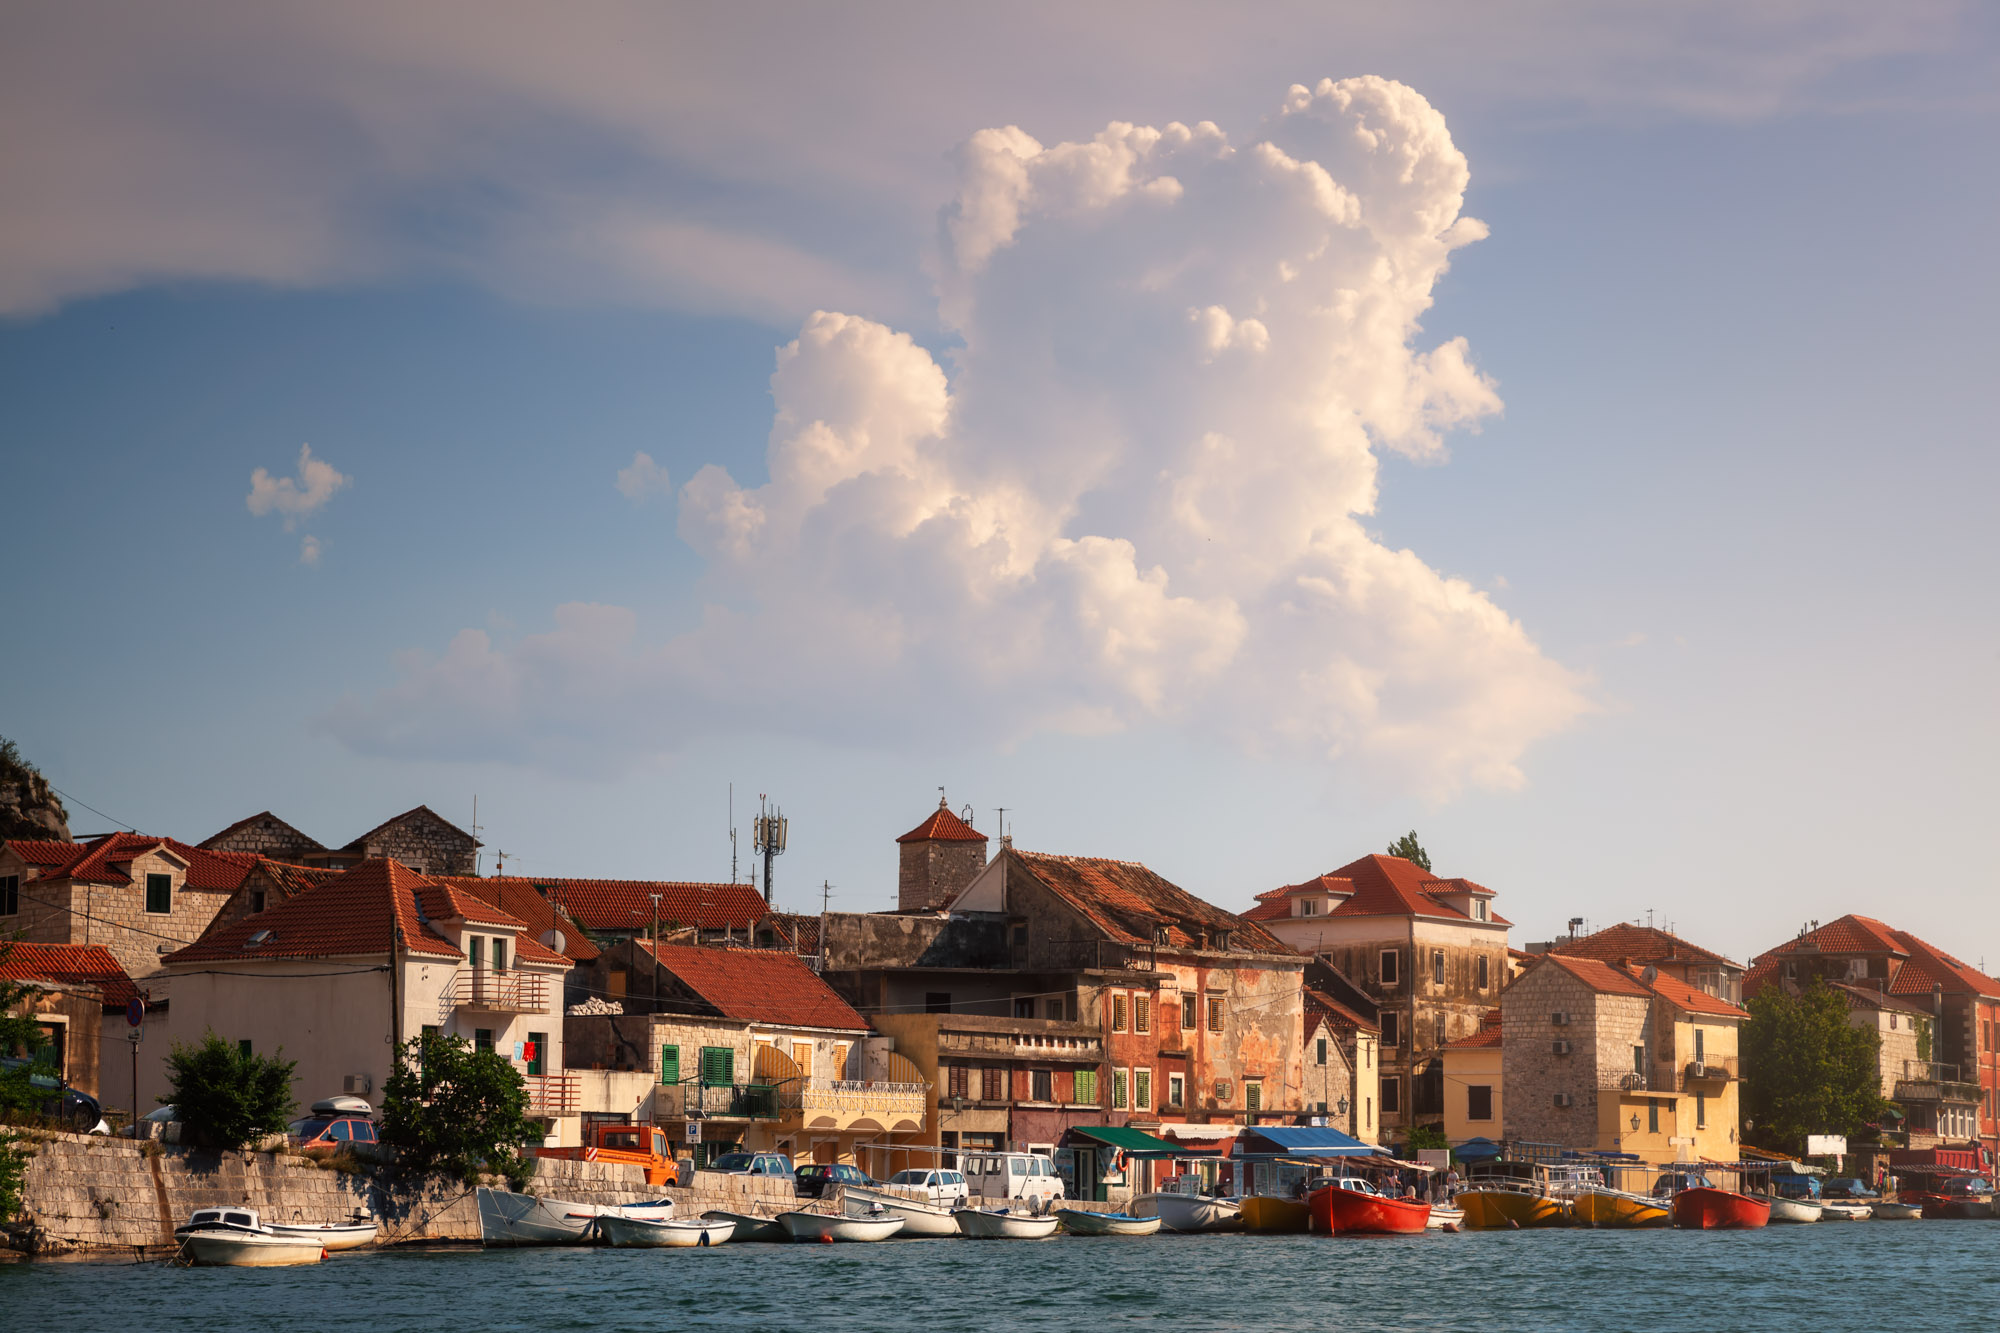 Medieval City of Omis and Cetina River, Croatia